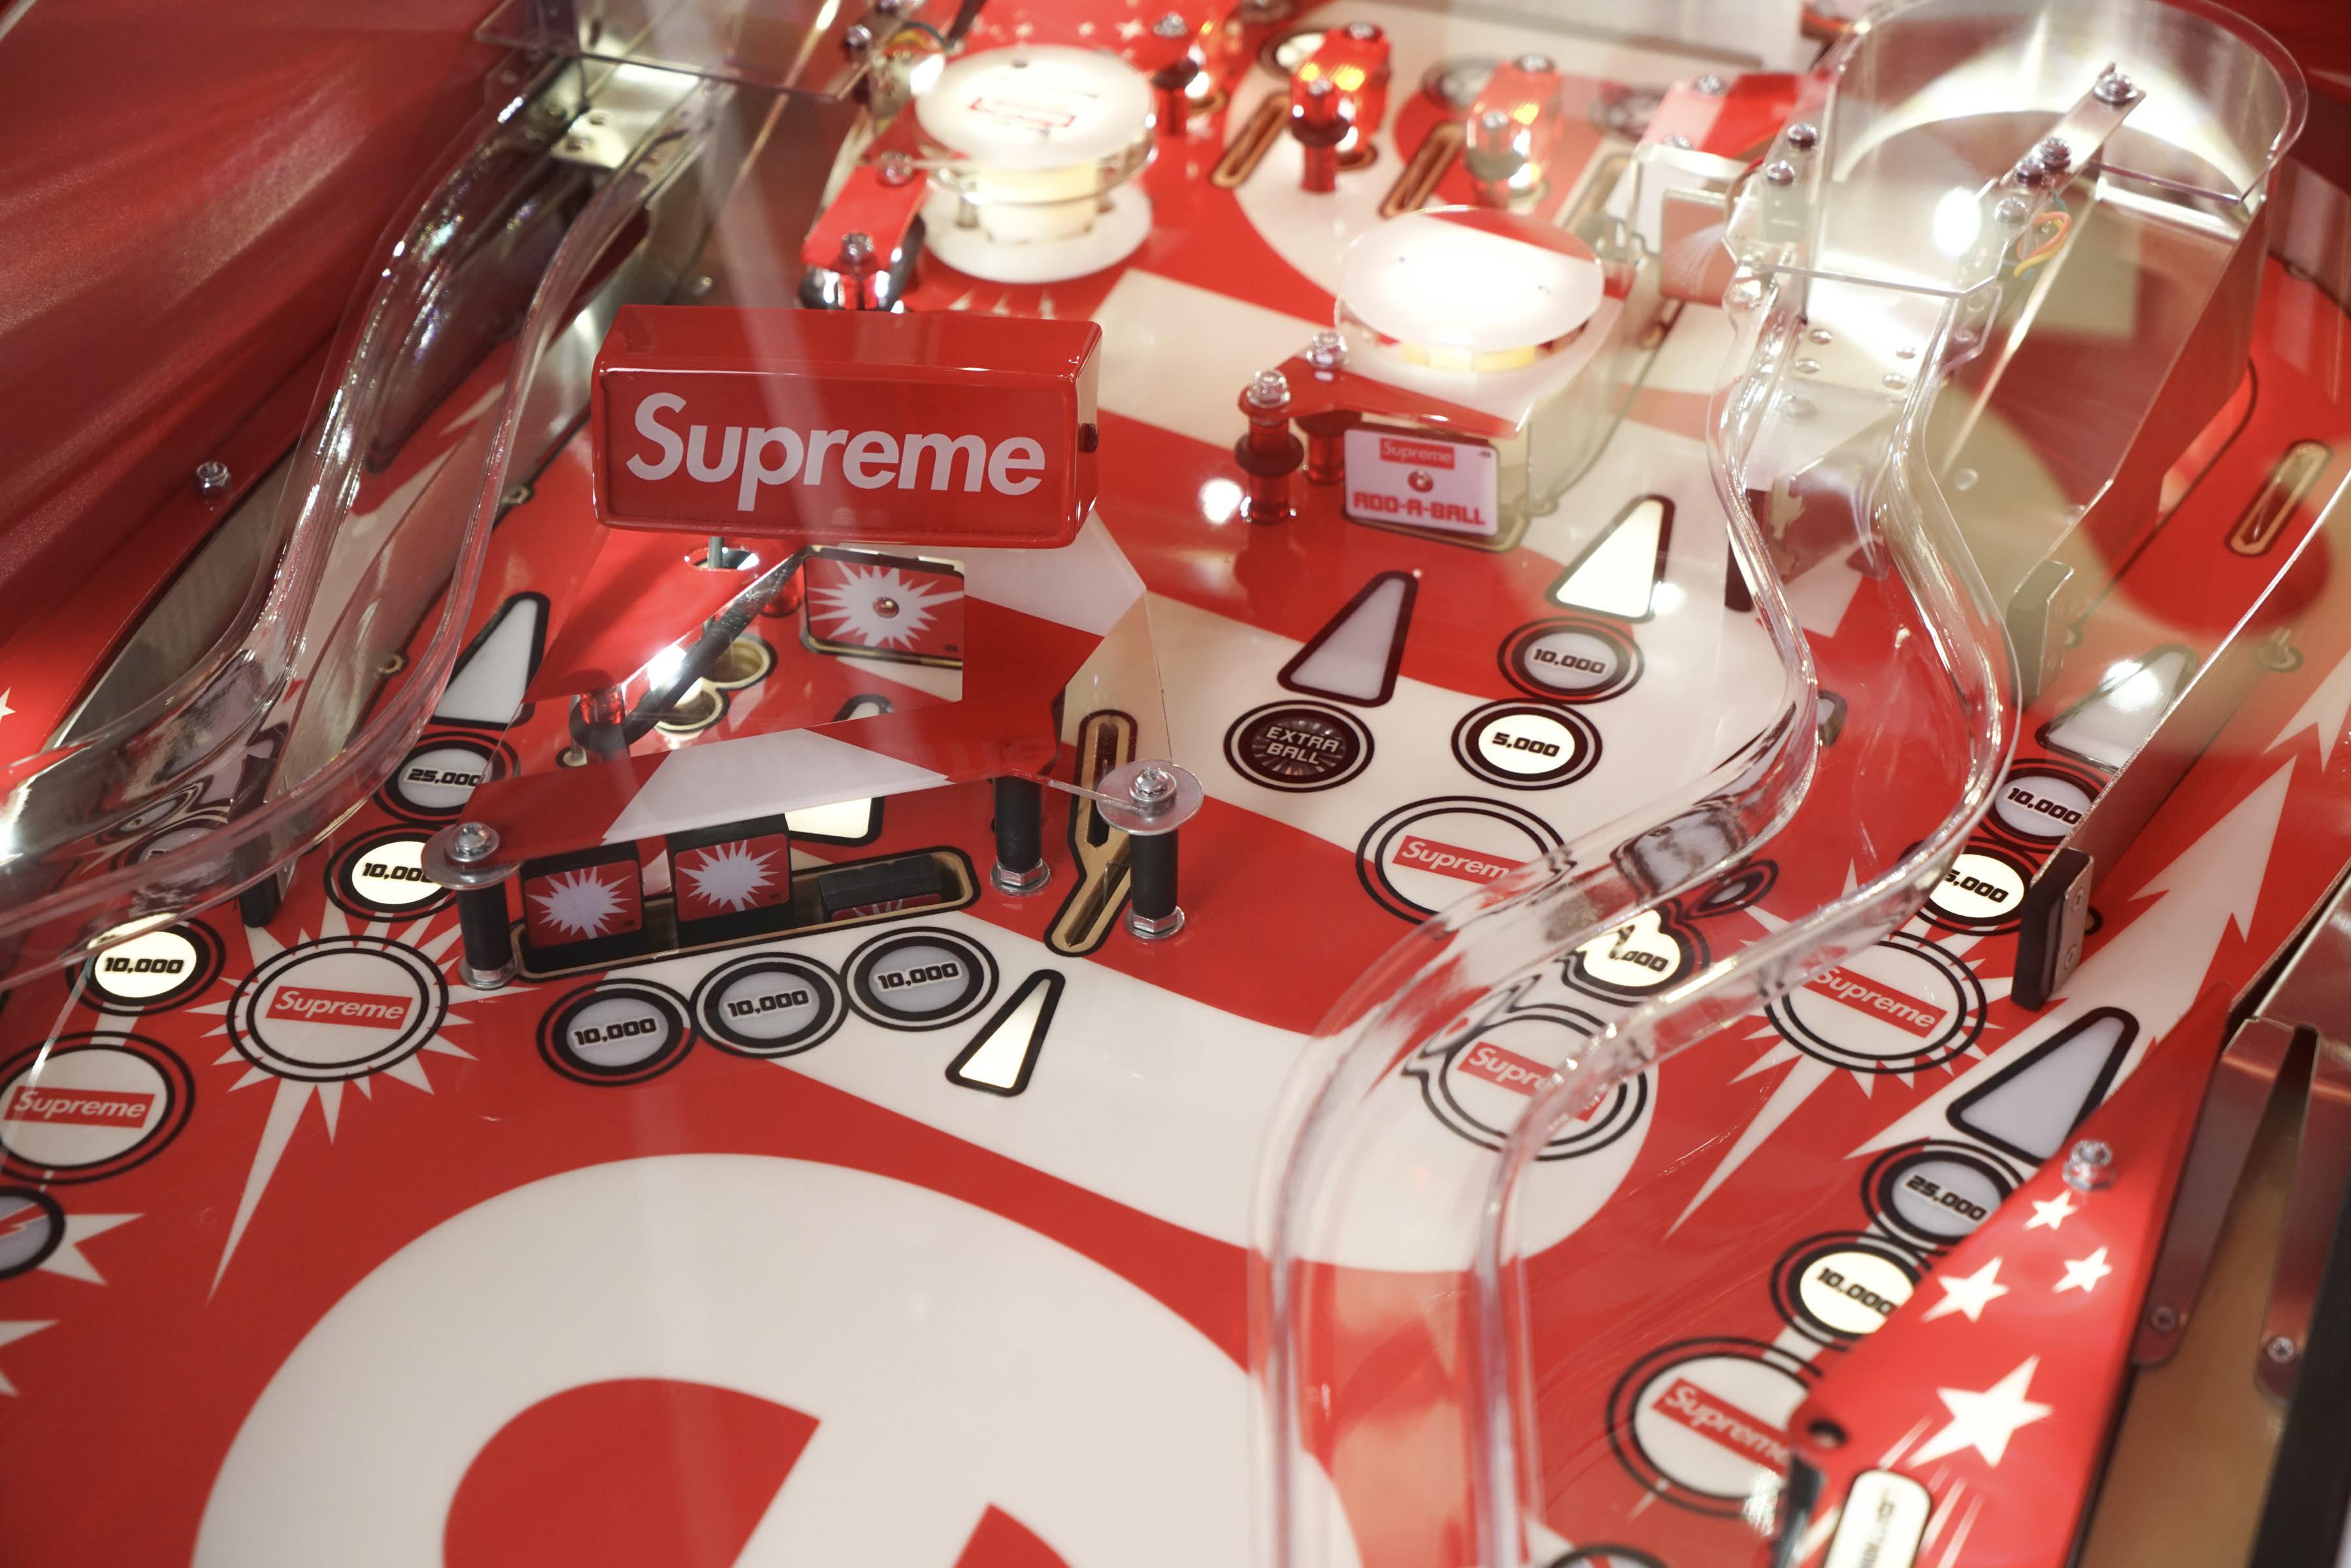 5ad40746f23e 競売大手サザビーズ(Sotheby's)が、「シュプリーム(Supreme)」の個人収集家による大規模コレクションのオンラインオークション「The  Supreme Vault:1998 - 2018」 ...